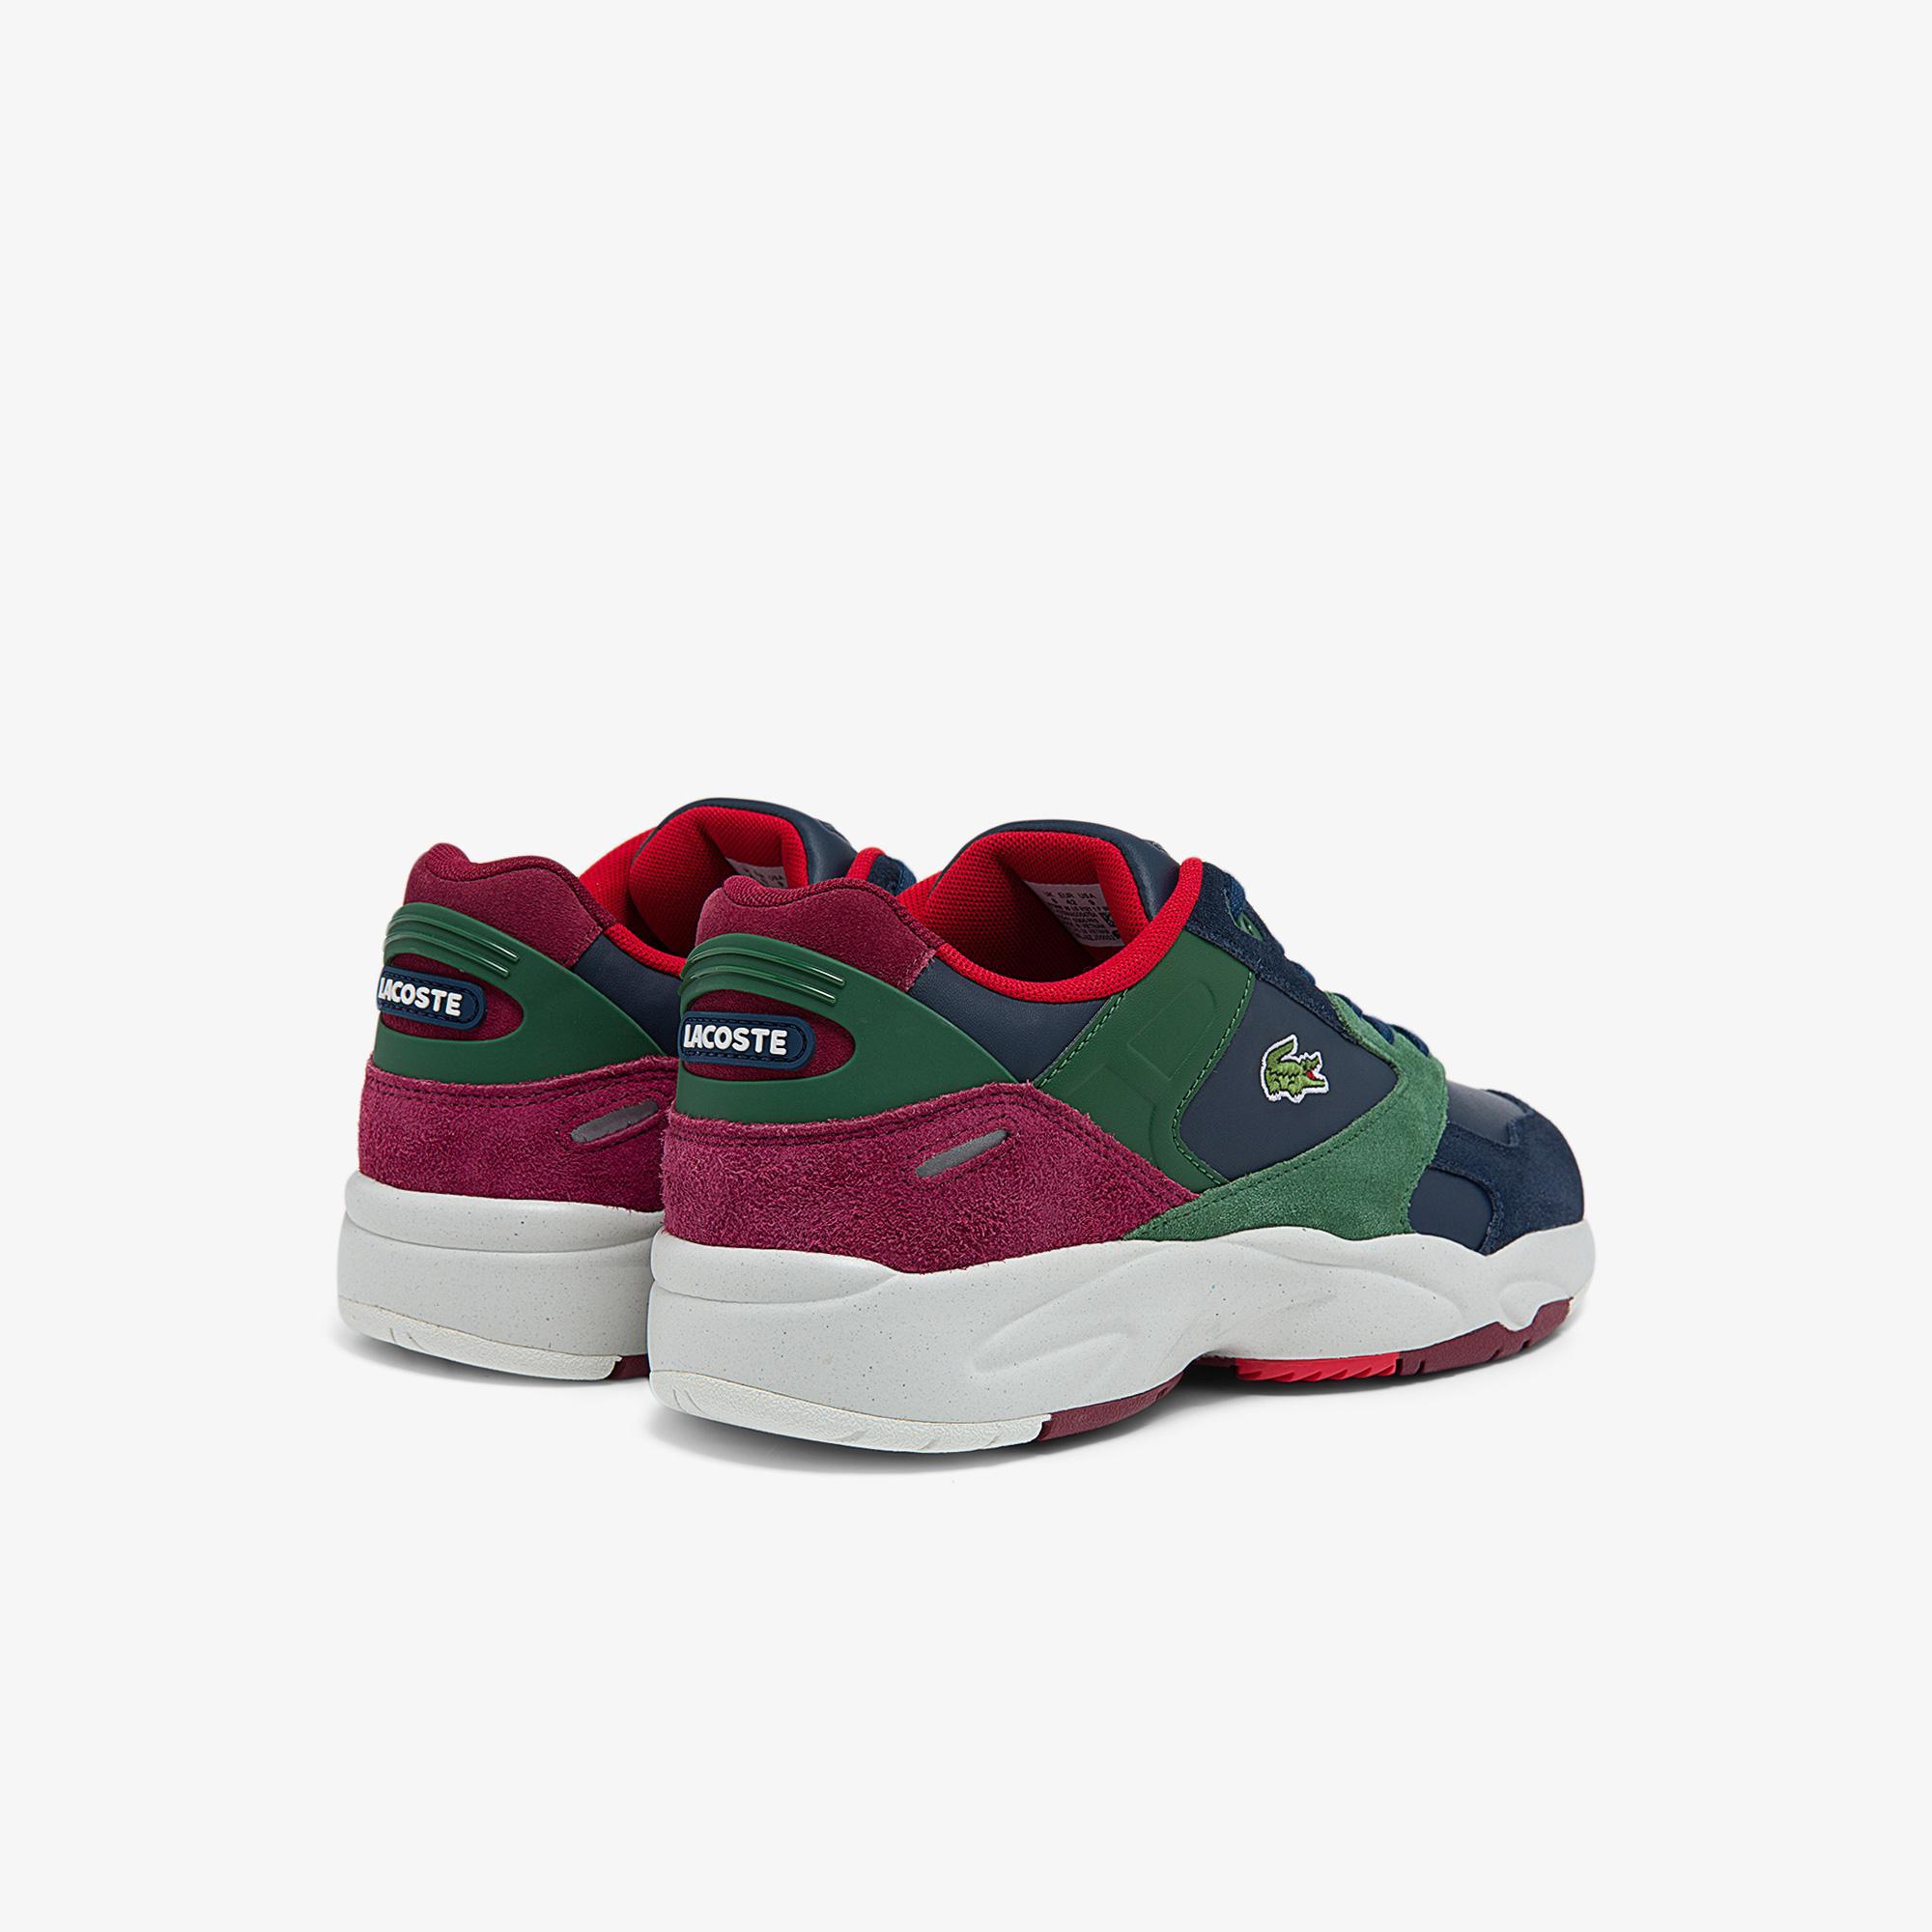 Lacoste Storm 96 Lo 0121 1 P Sma Erkek Lacivert - Yeşil Sneaker